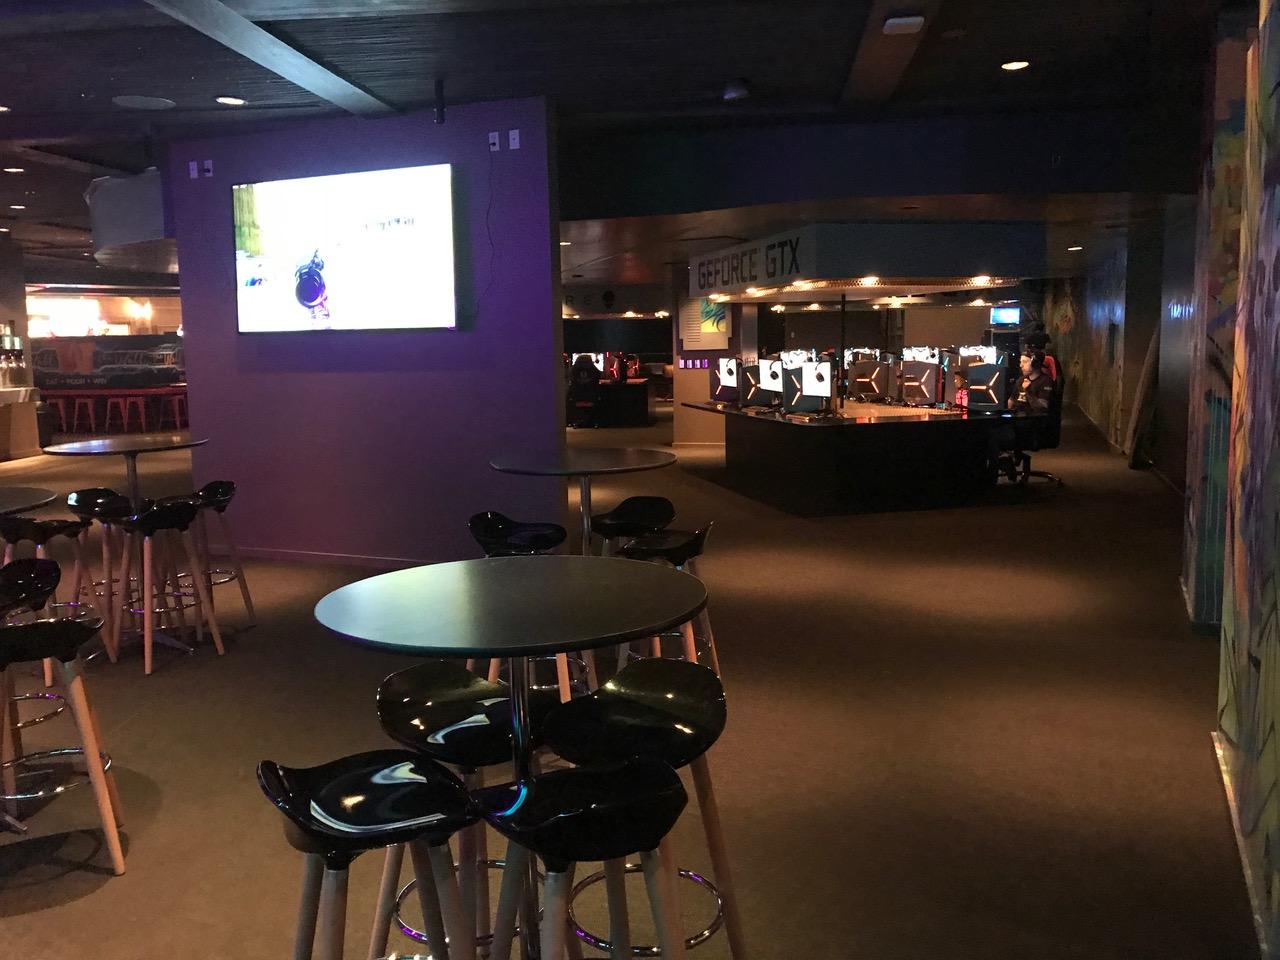 The Wall Gaming Lounge & Esports Bar   Esports in Las Vegas